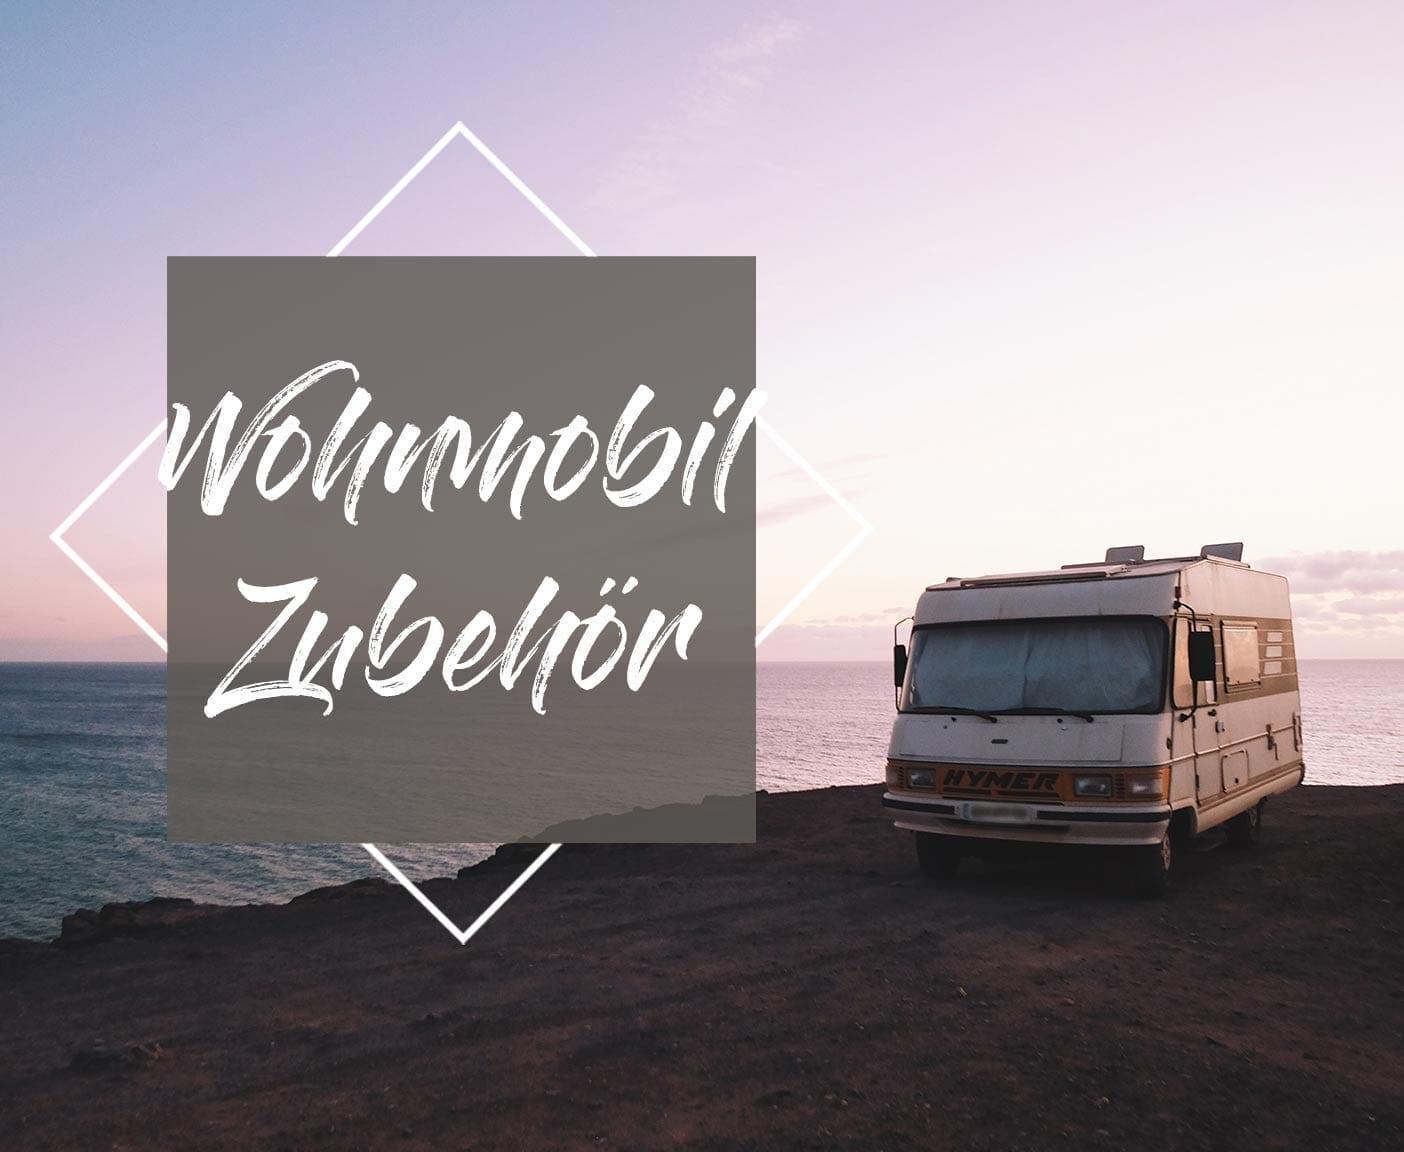 wohnmobil-zubehoer-camperausstattung-reise-camping-